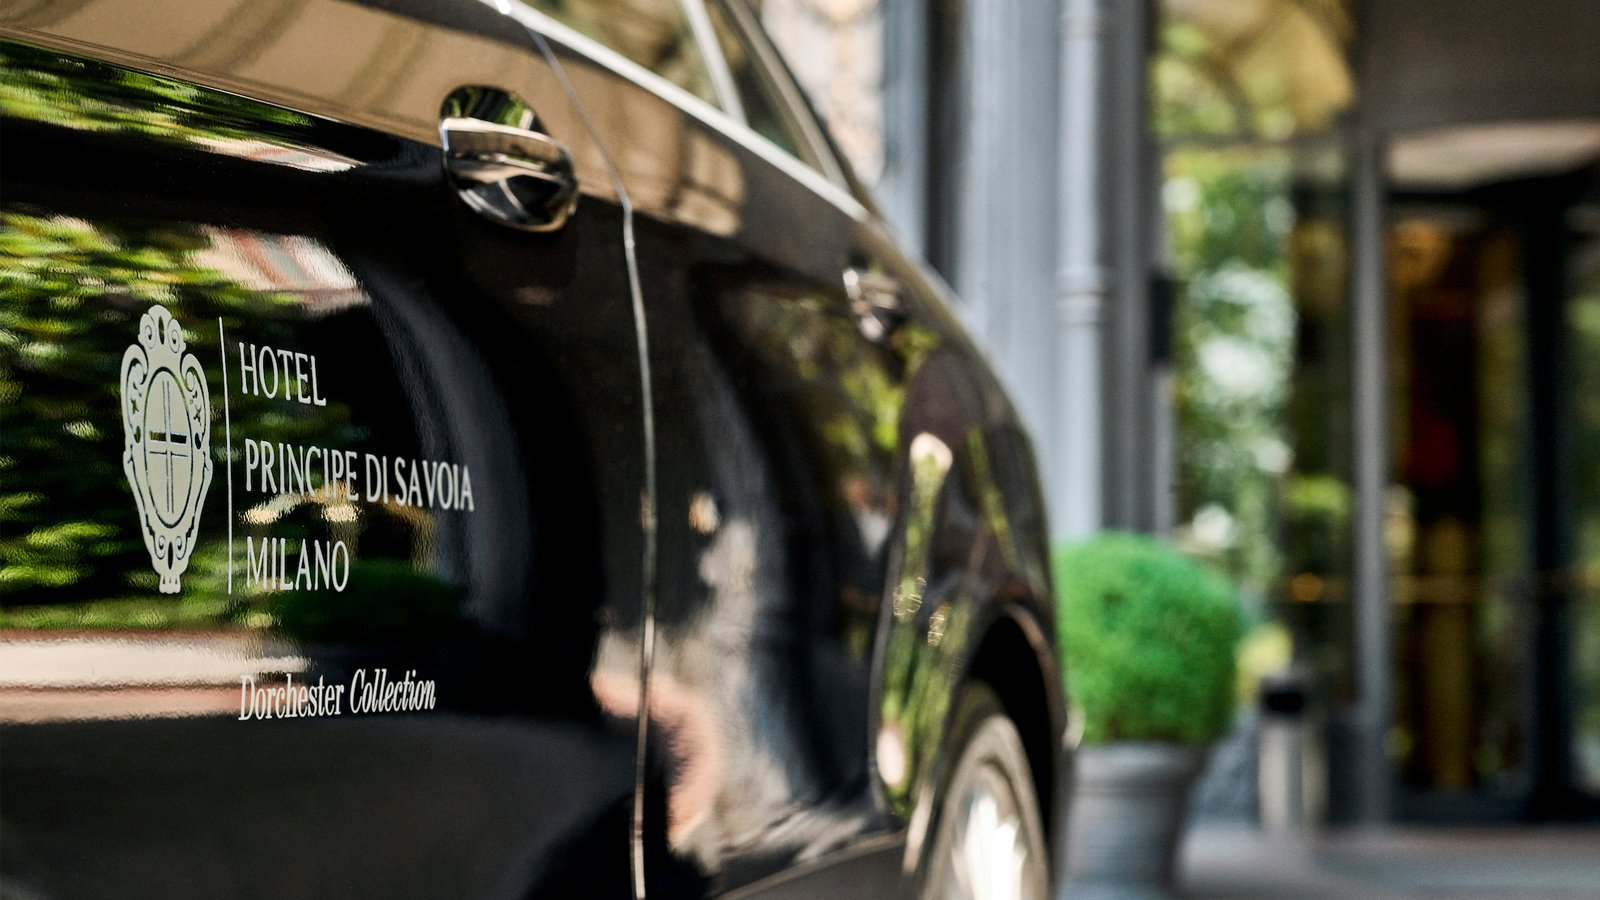 Limousine, Hotel Principe di Savoia, Milan